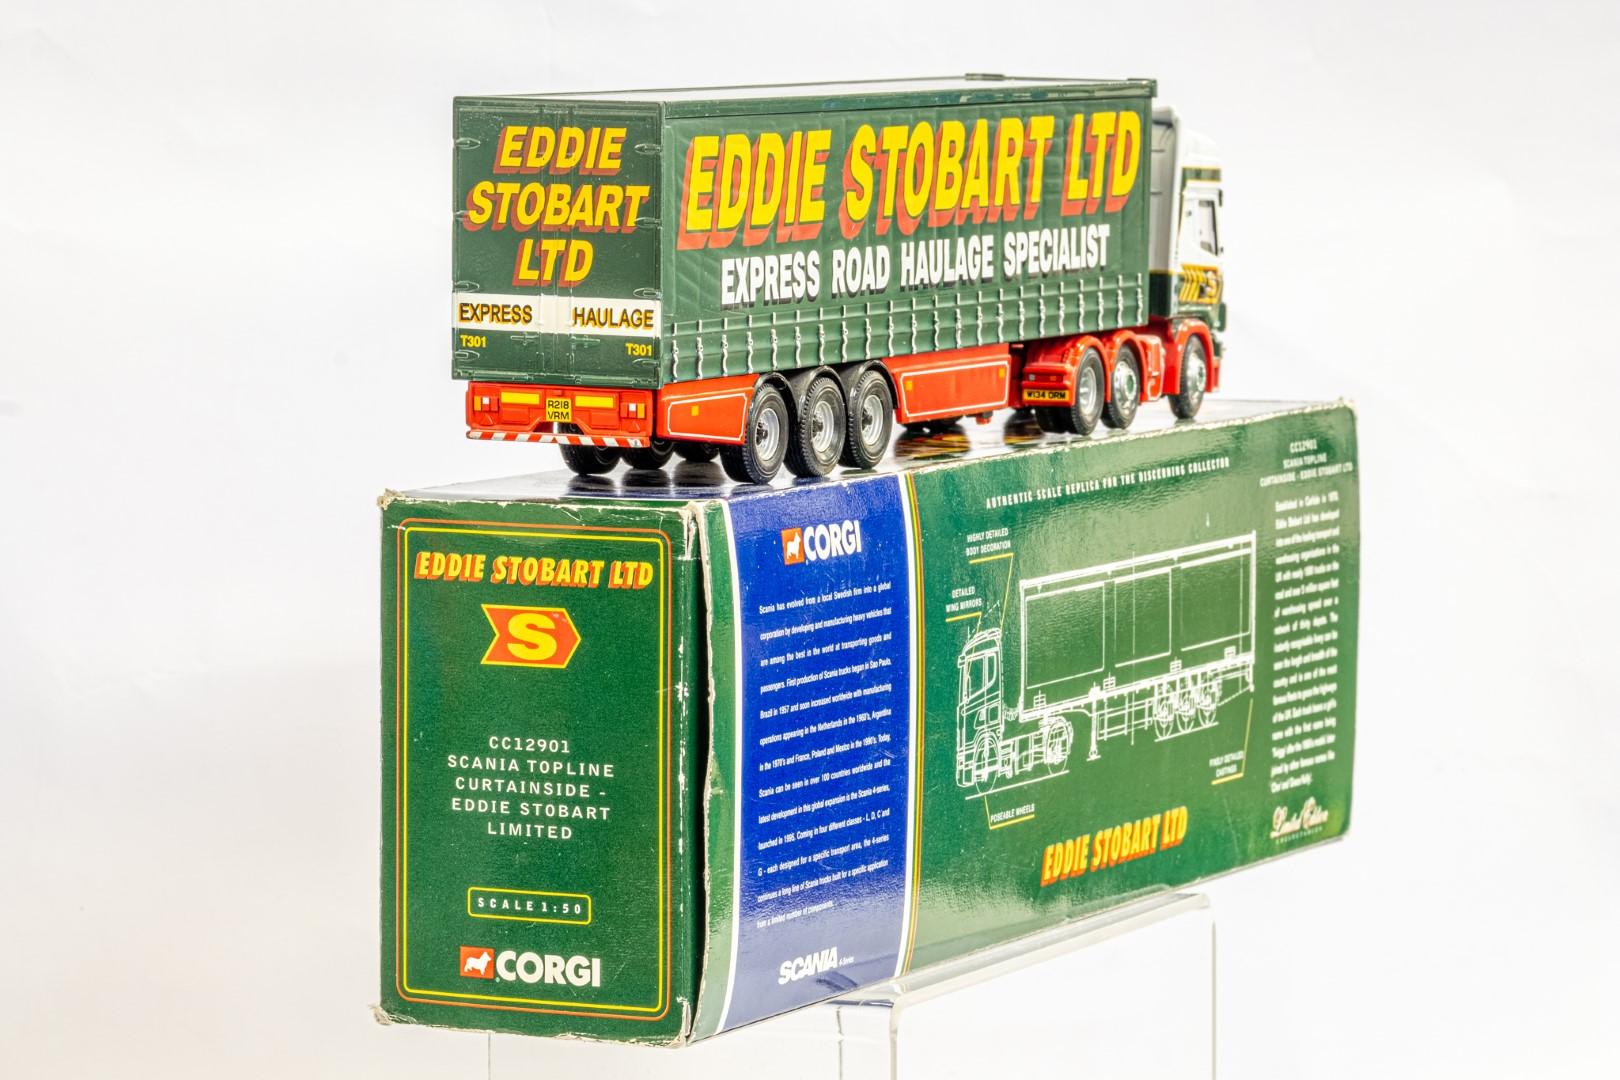 Corgi Scania Topline Curtainside Trailer - Eddie Stobart - Image 3 of 7